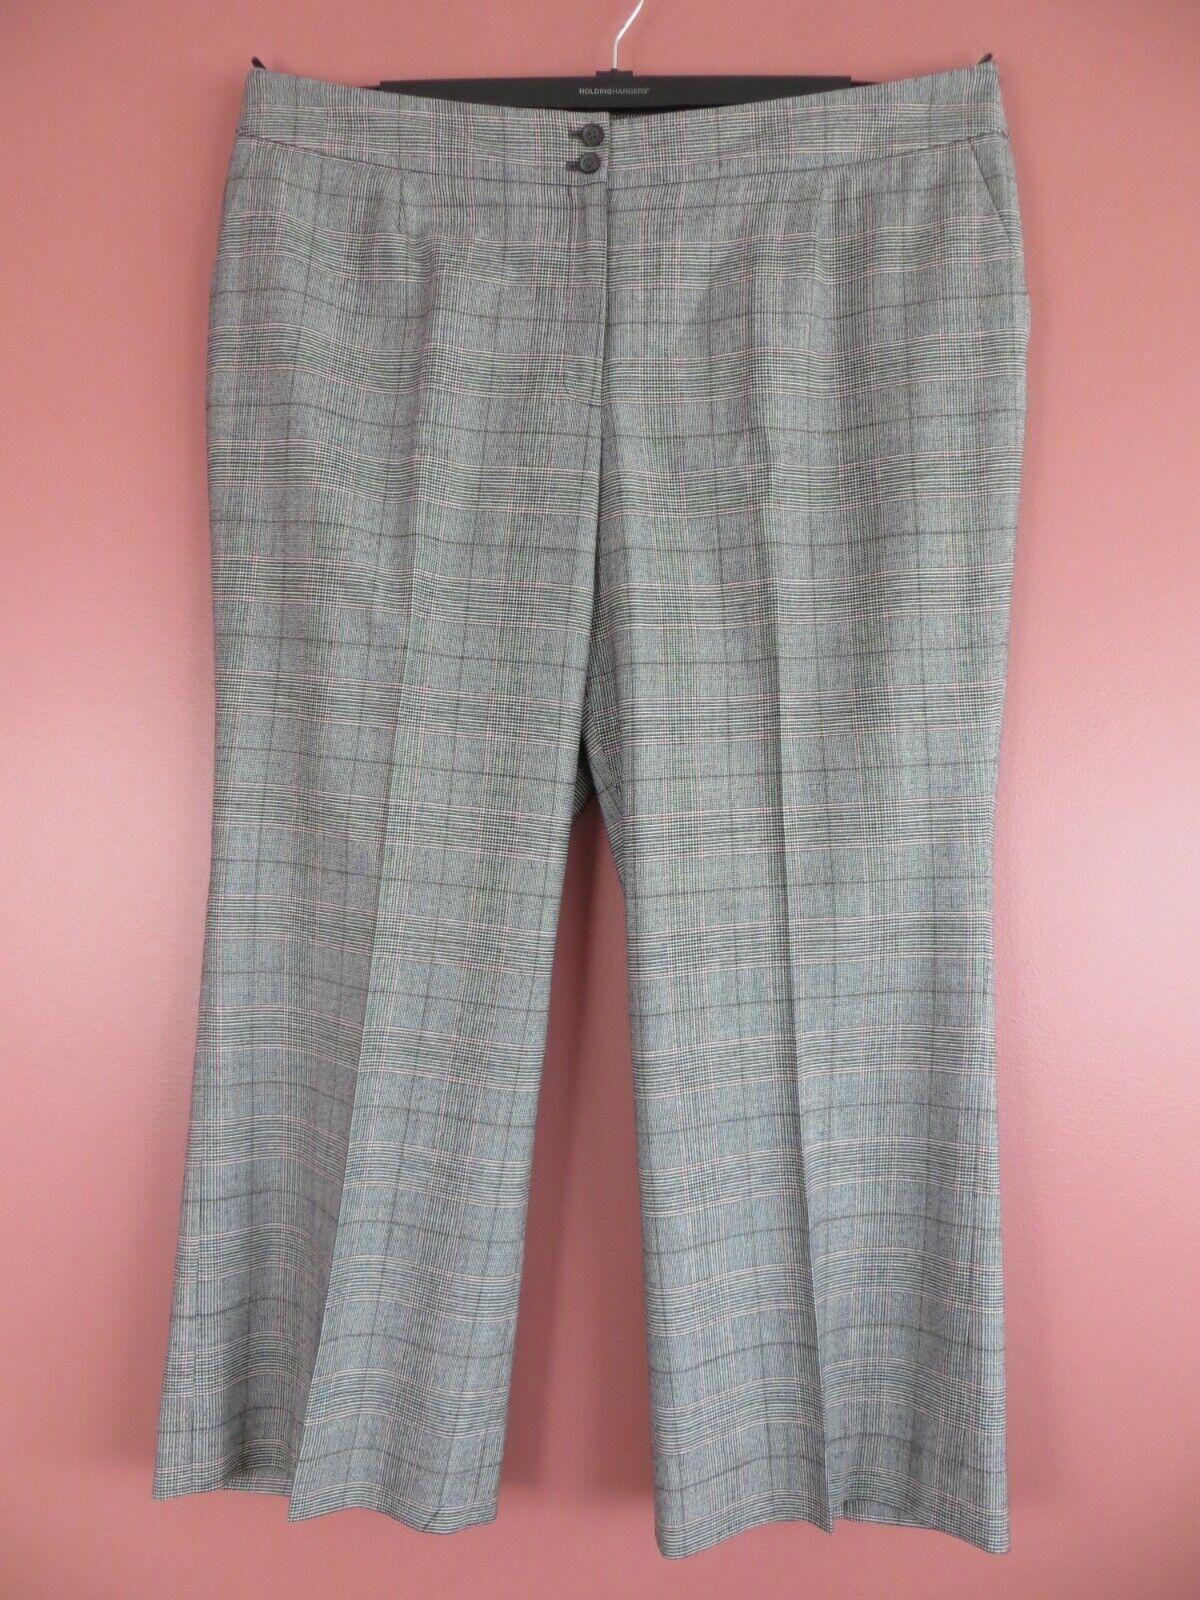 PNS1221- TALBOTS Womens 40% Wool Heritage Wide Leg Pants Multi-color Geo Sz 18W